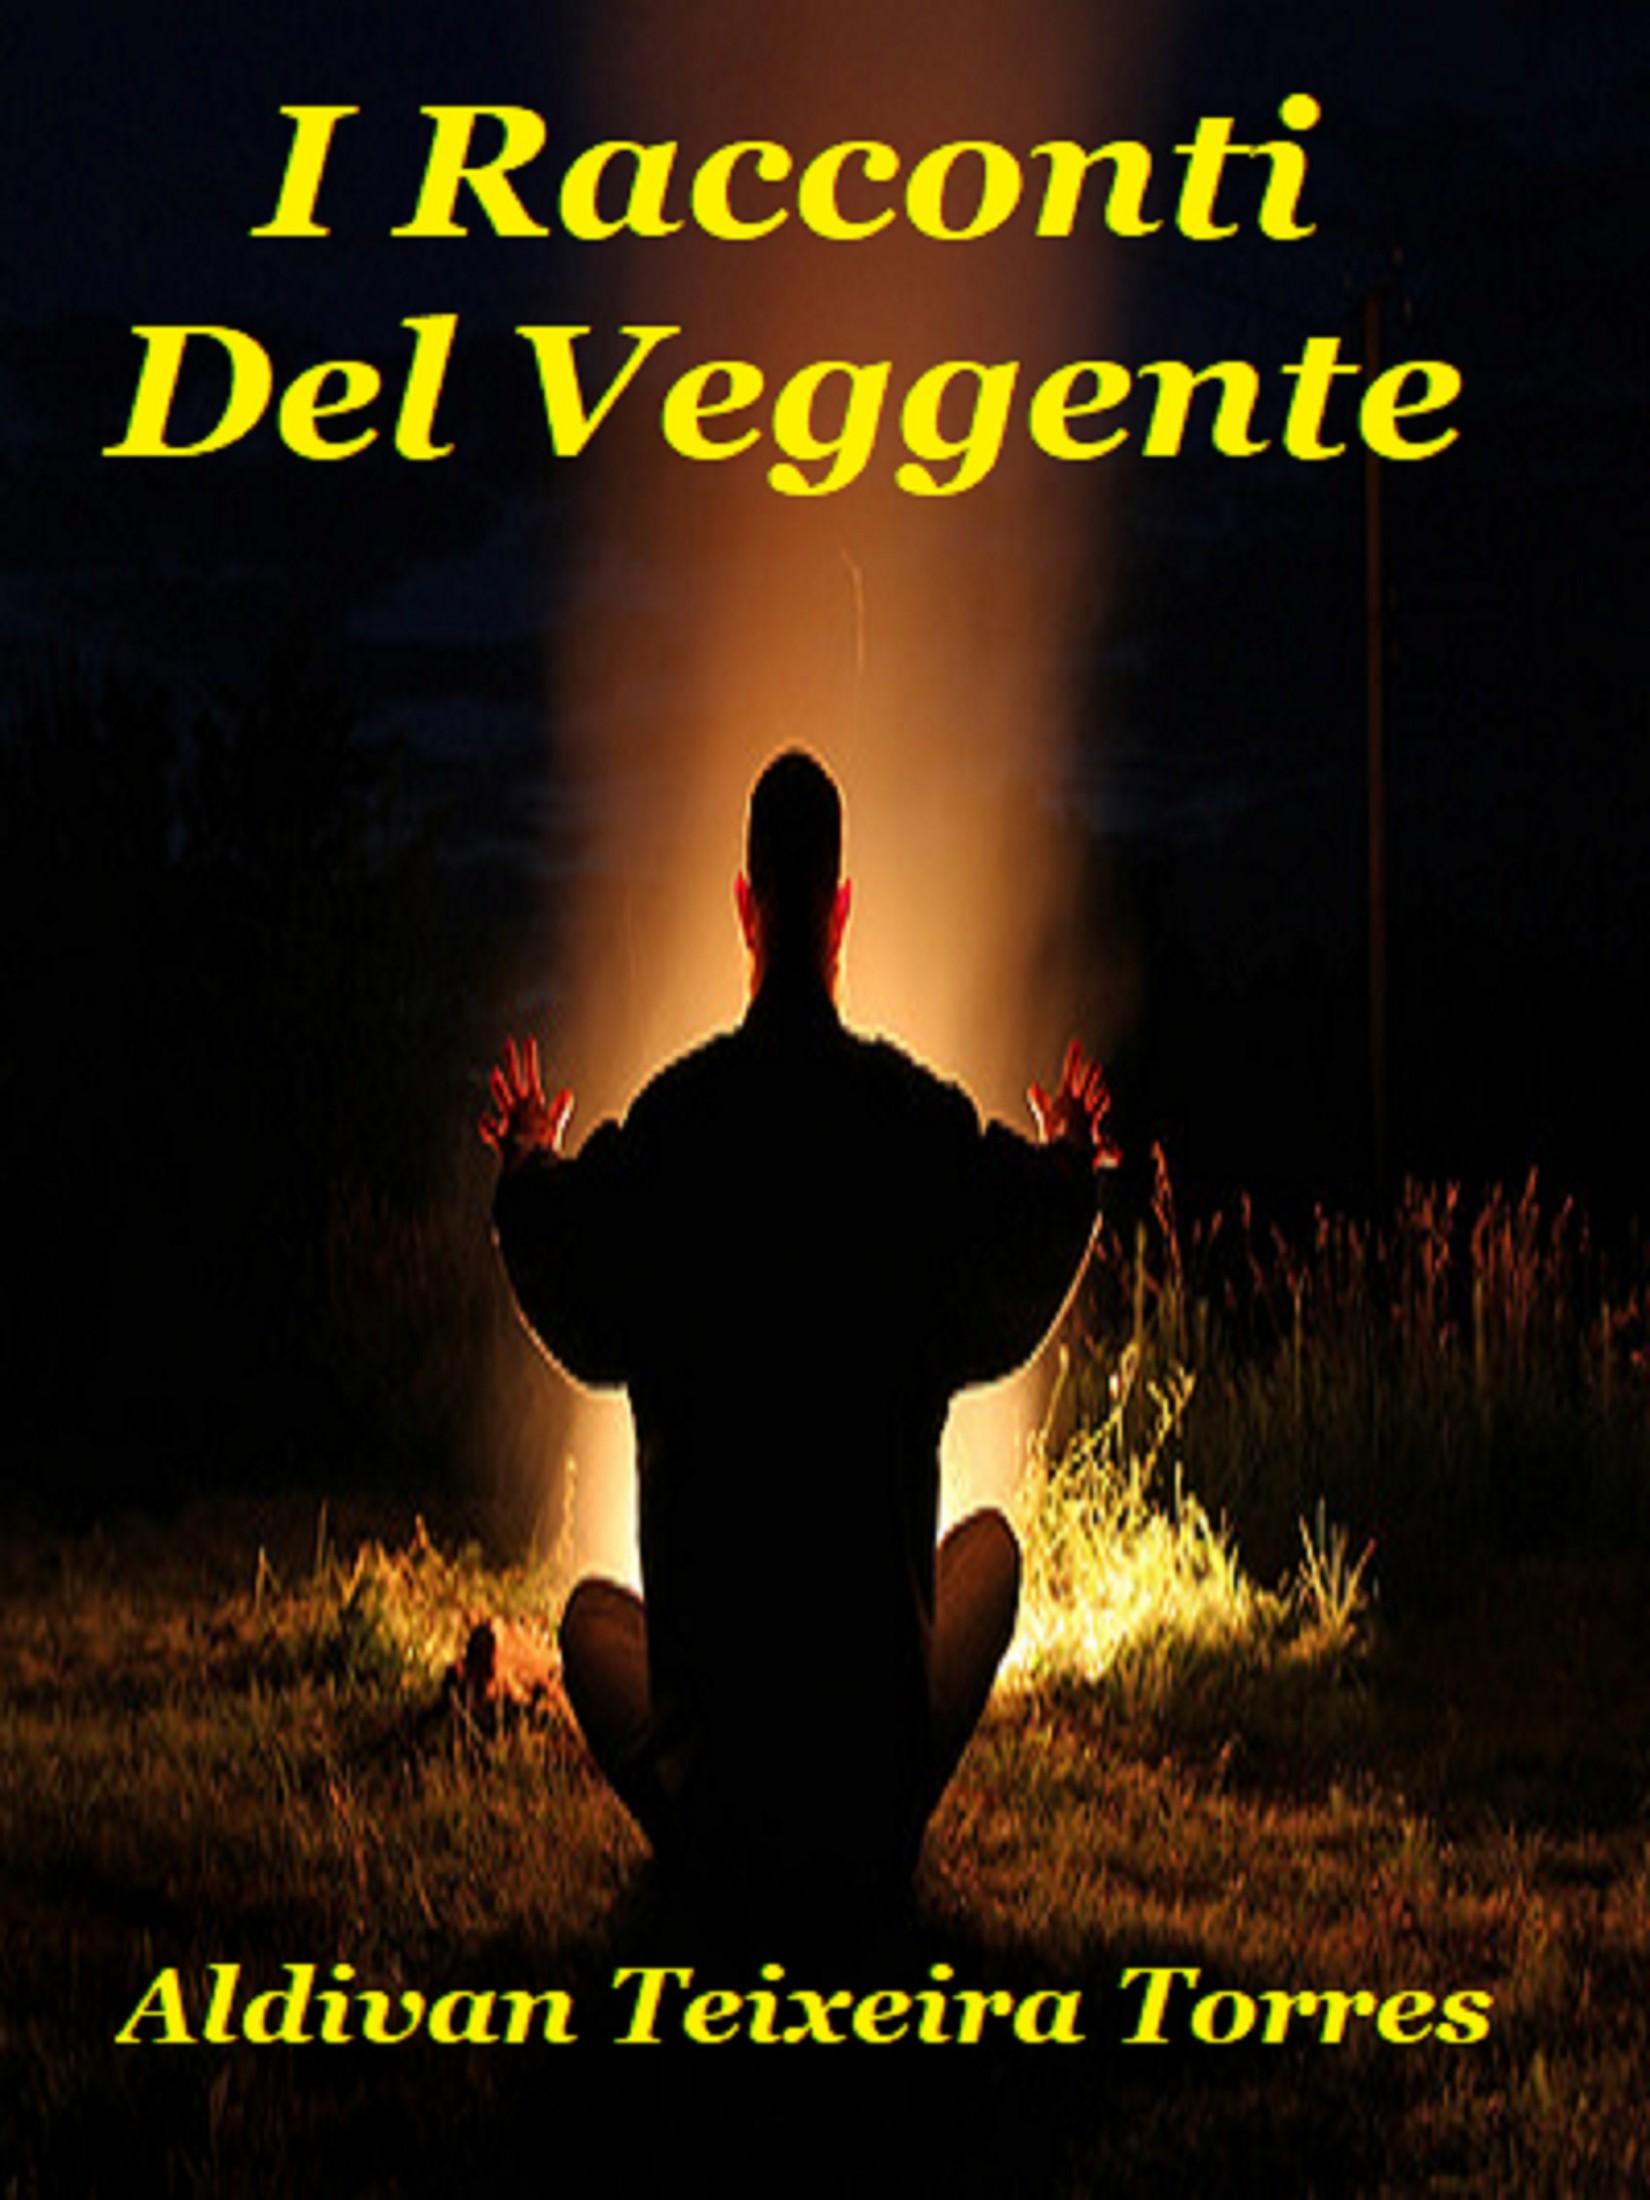 лучшая цена Aldivan Teixeira Torres I Racconti Del Veggente